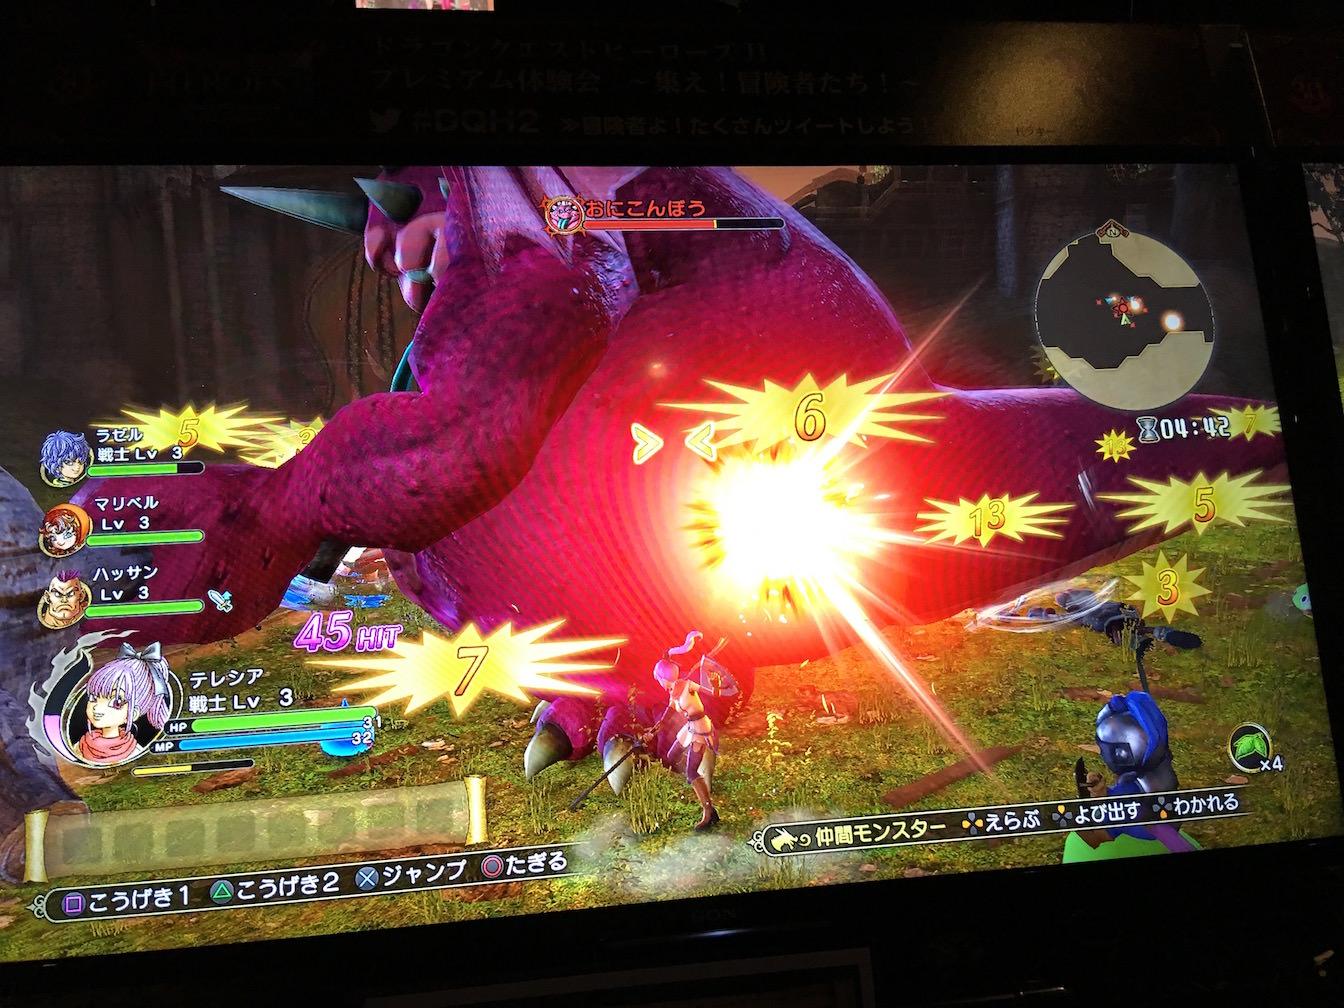 Dragon quest heros 2 premium experience meeting report 23